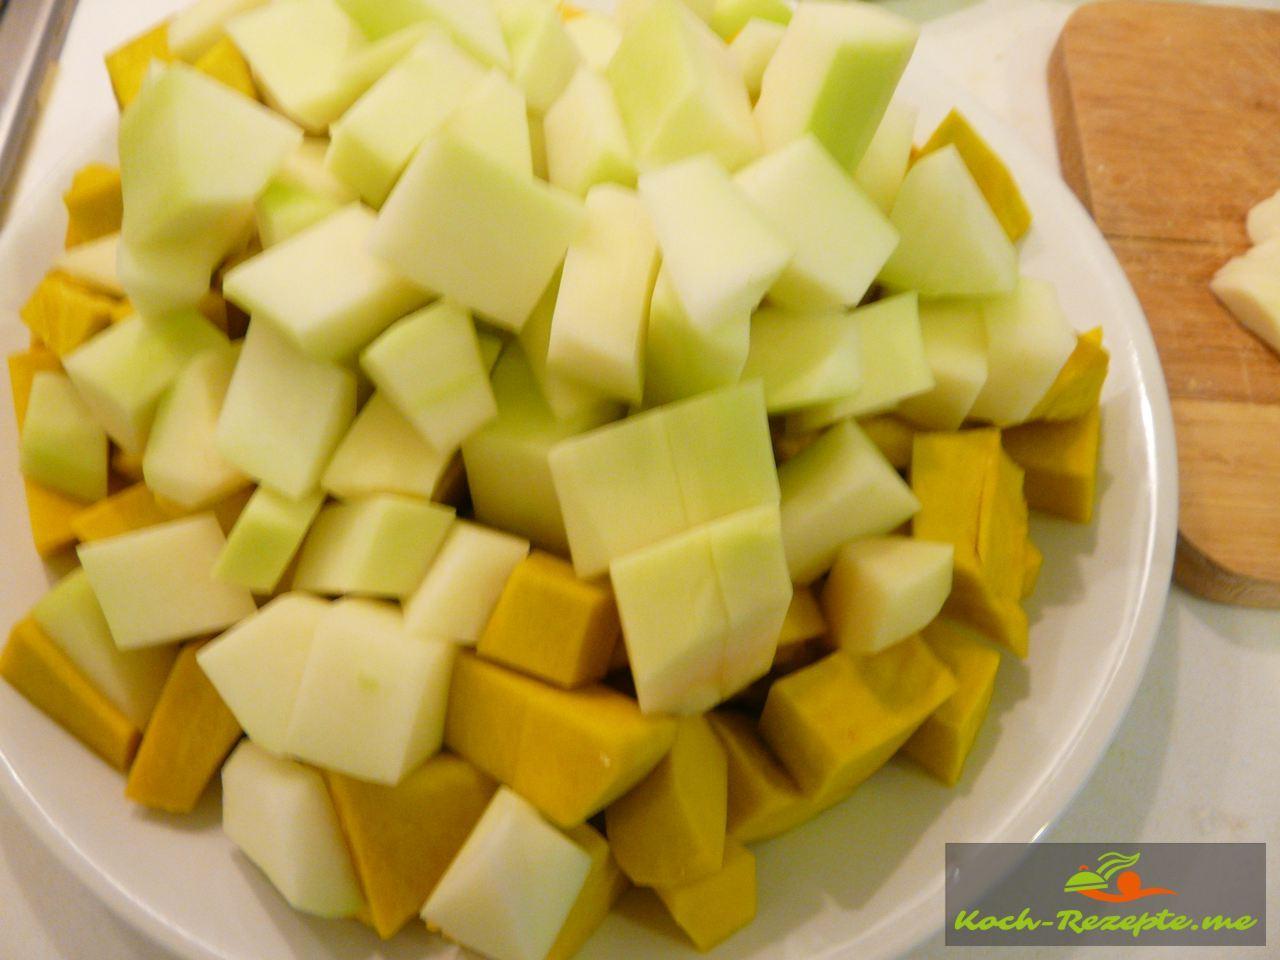 Pumpkin und Papaya gewürfelt